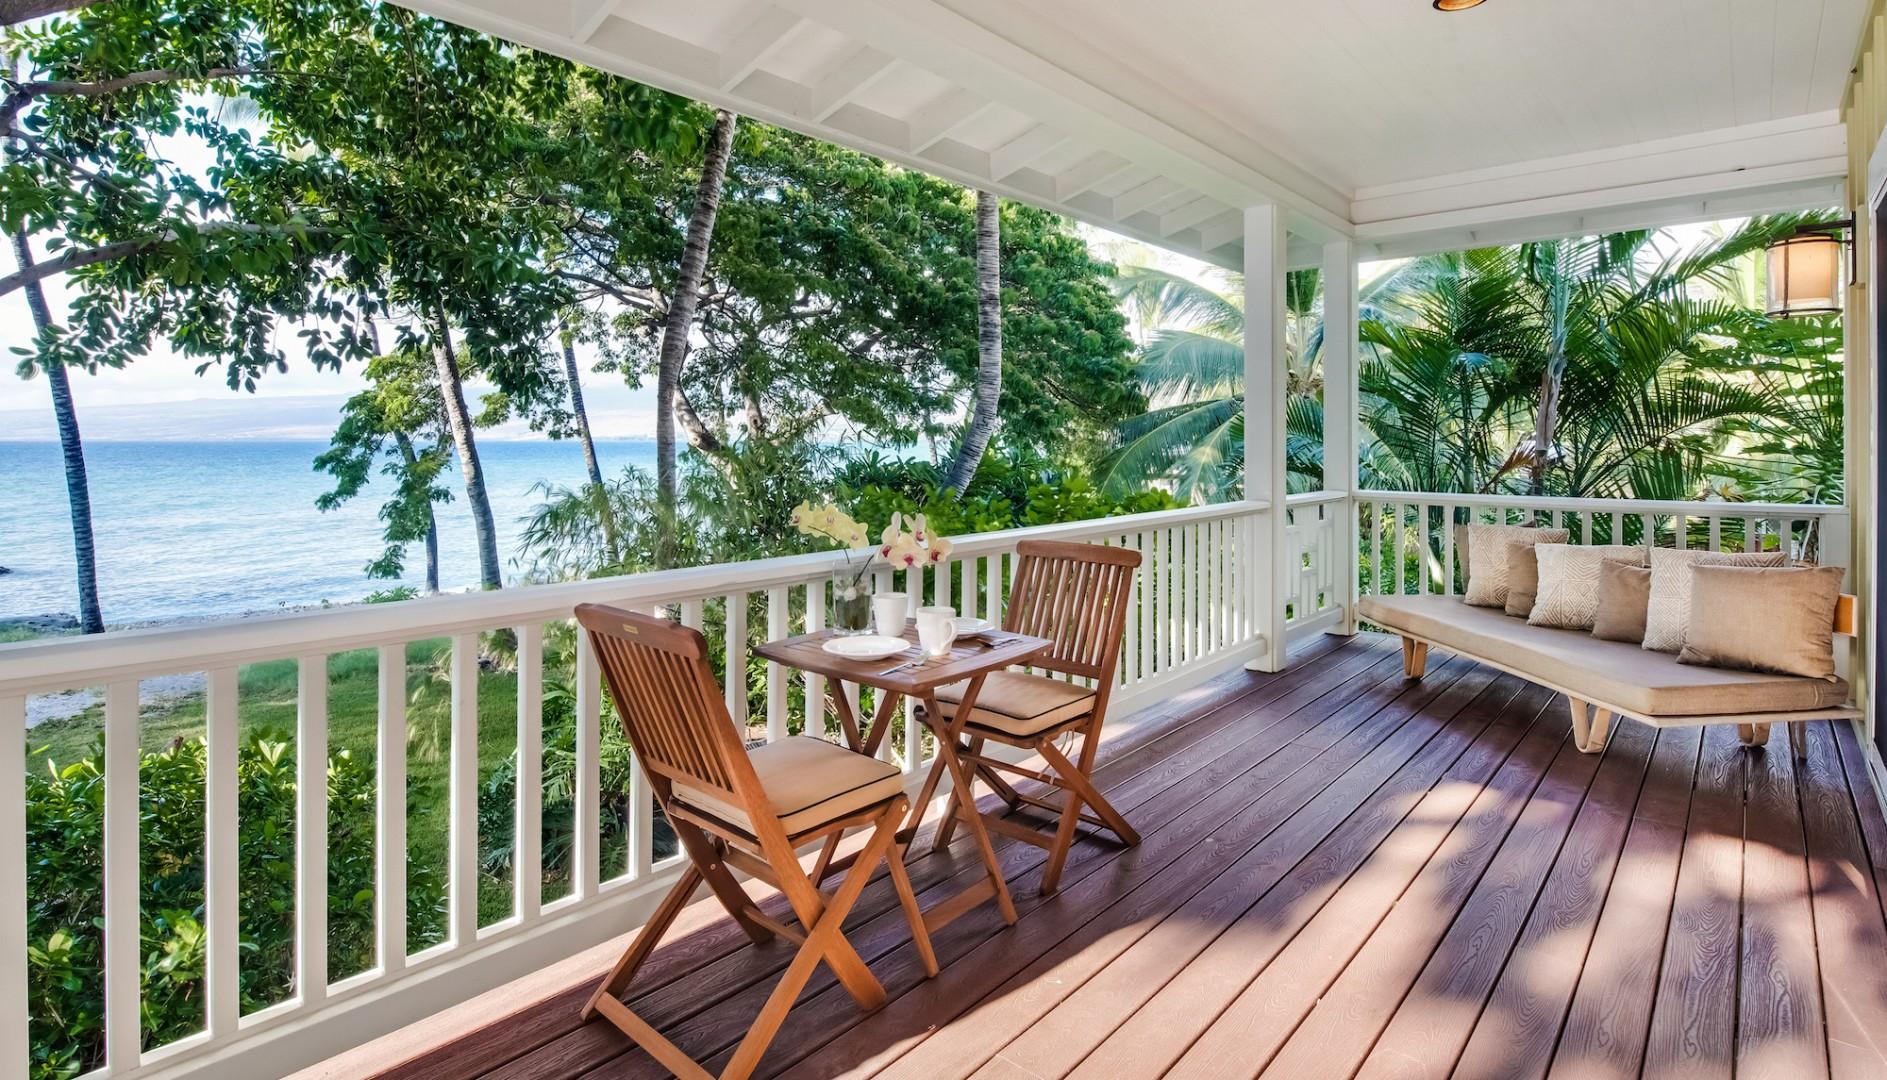 Ohana Guest Cottage Private Lanai w/ Spectacular Ocean & Garden Views.